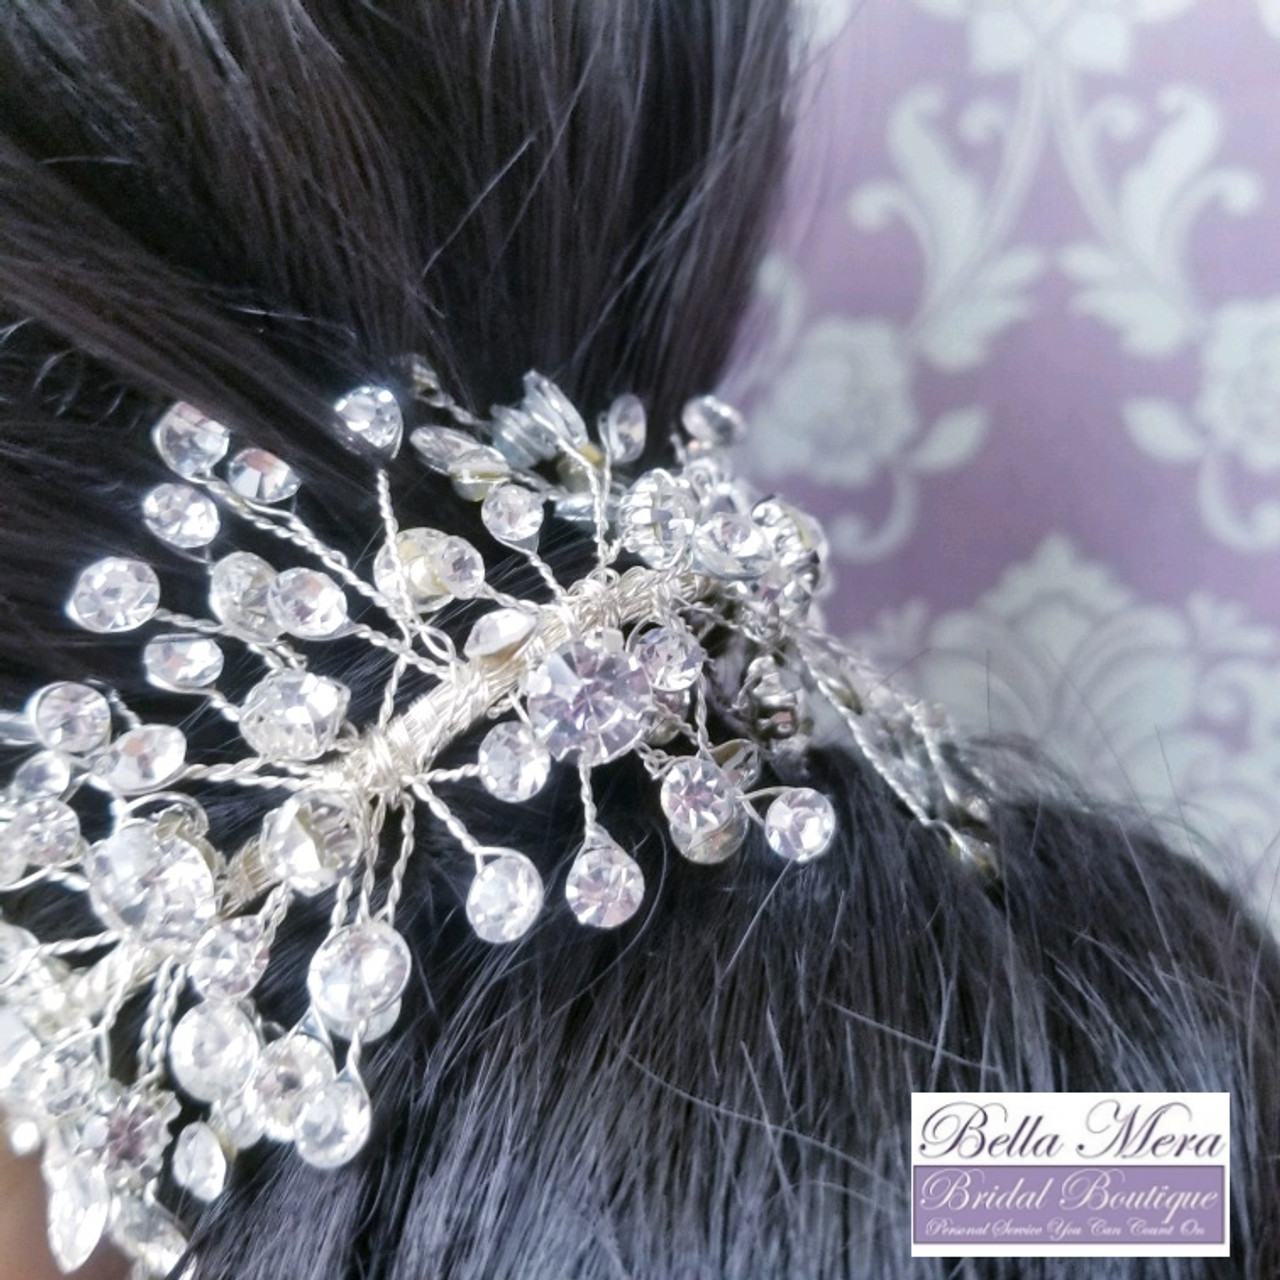 Bella Mera Bridal - Bun Wrap or Side Headband - Style HP400